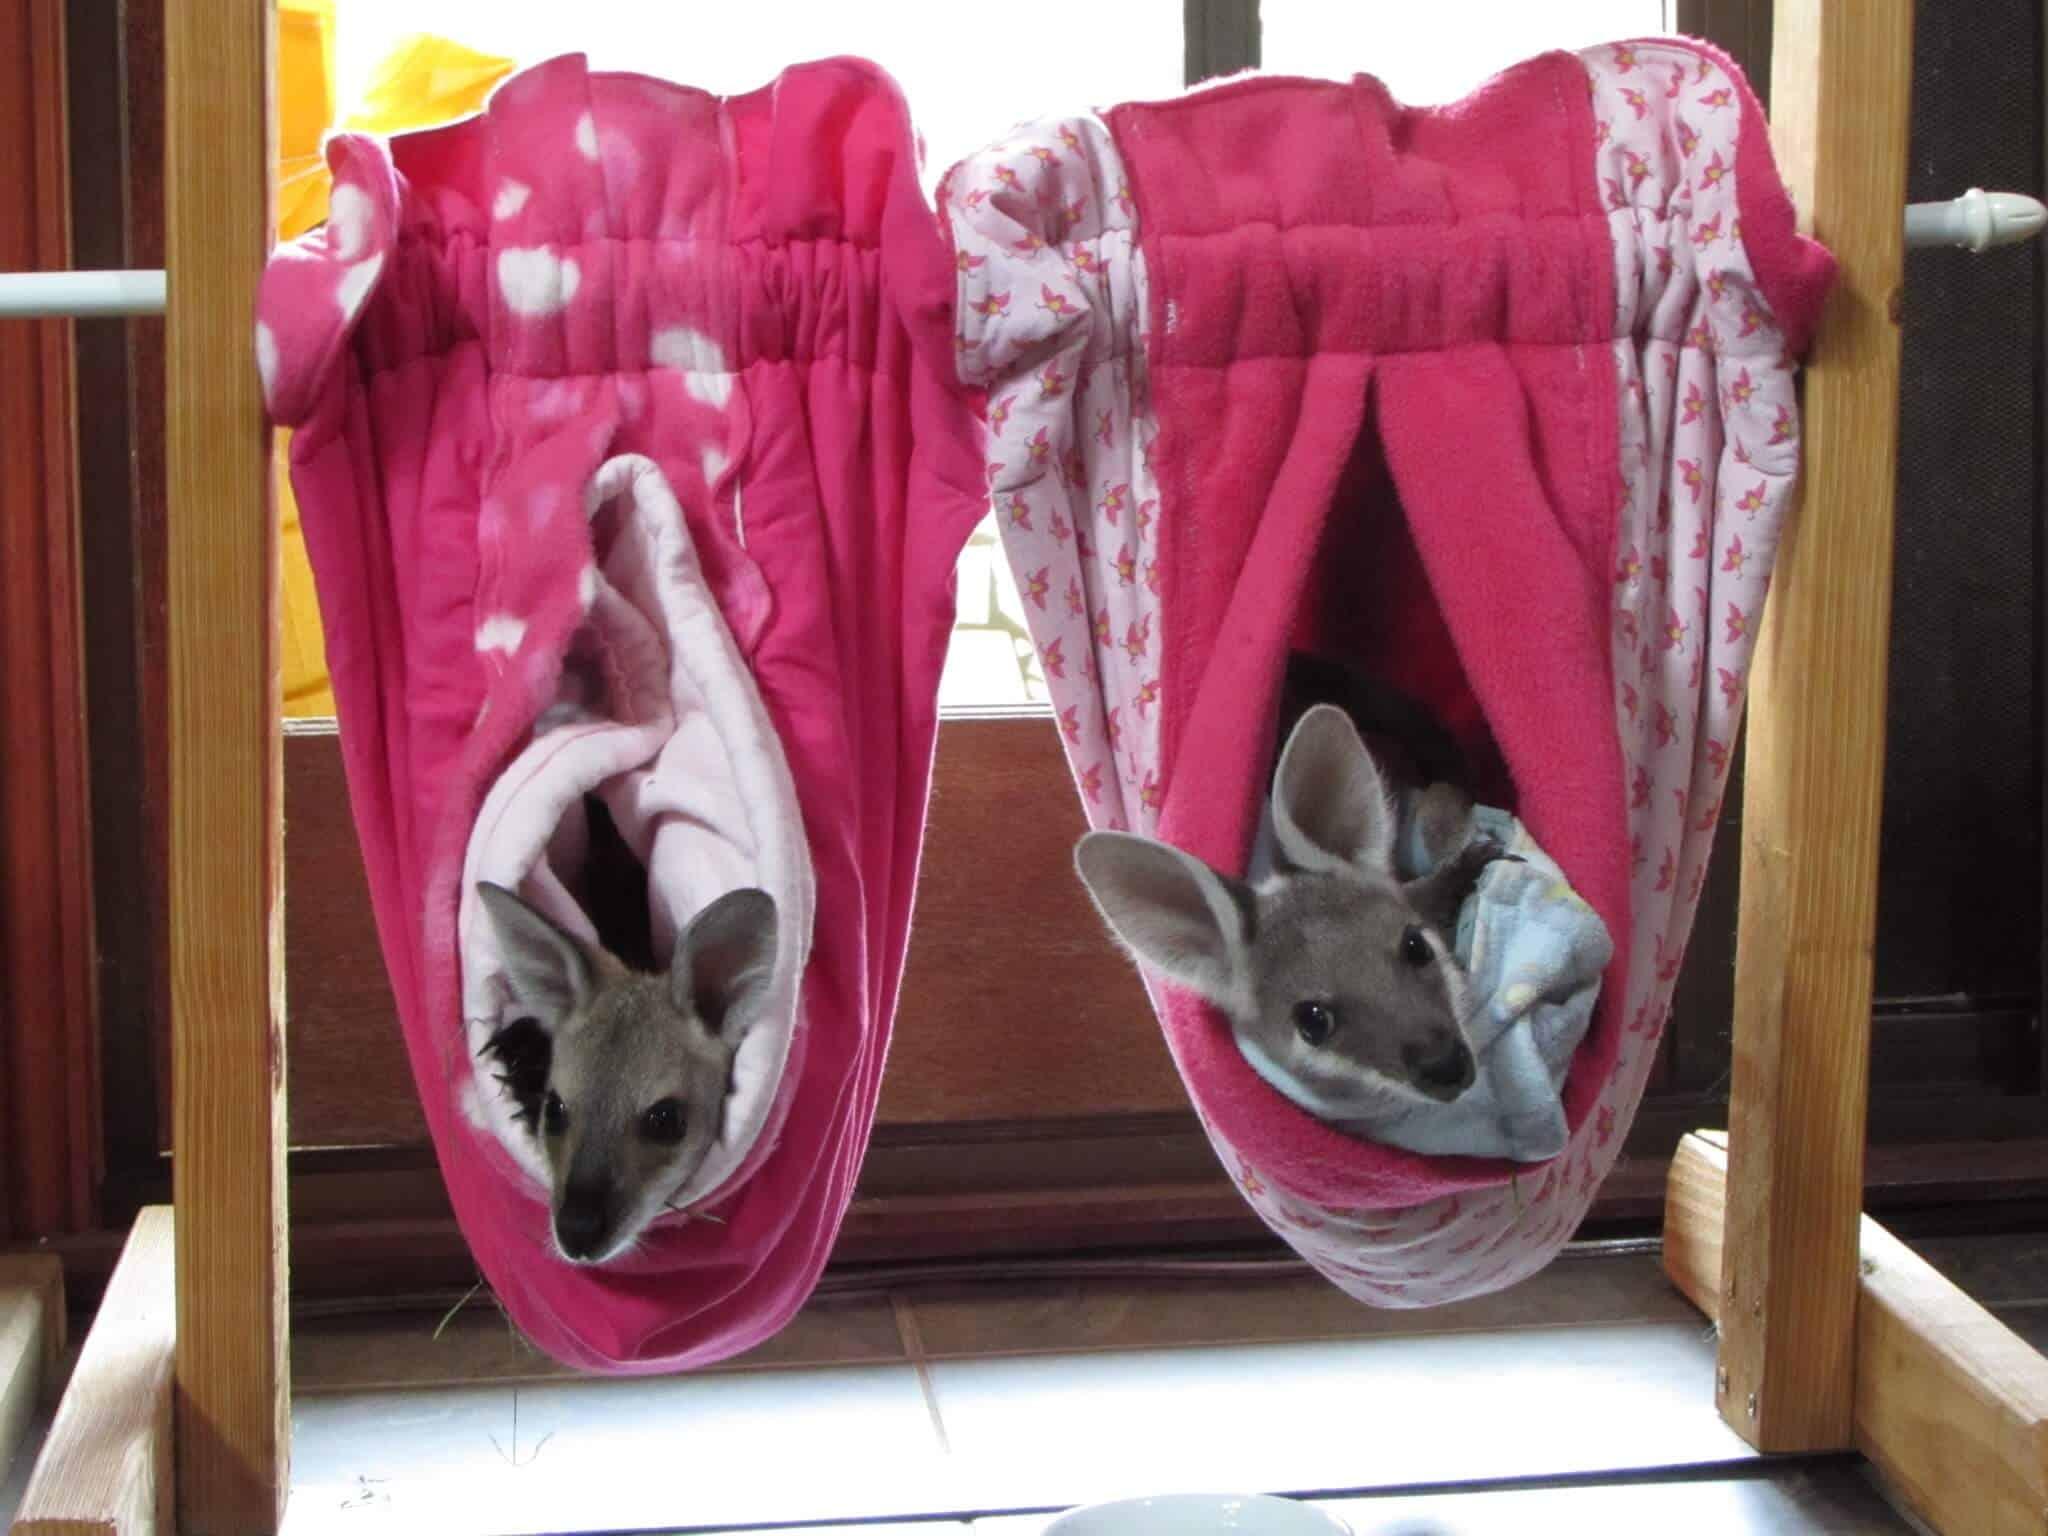 Volunteering at a Kangaroo Sanctuary -baby joeys safe and sound at Oakview Wildlife Refuge via @greenglobaltrvl